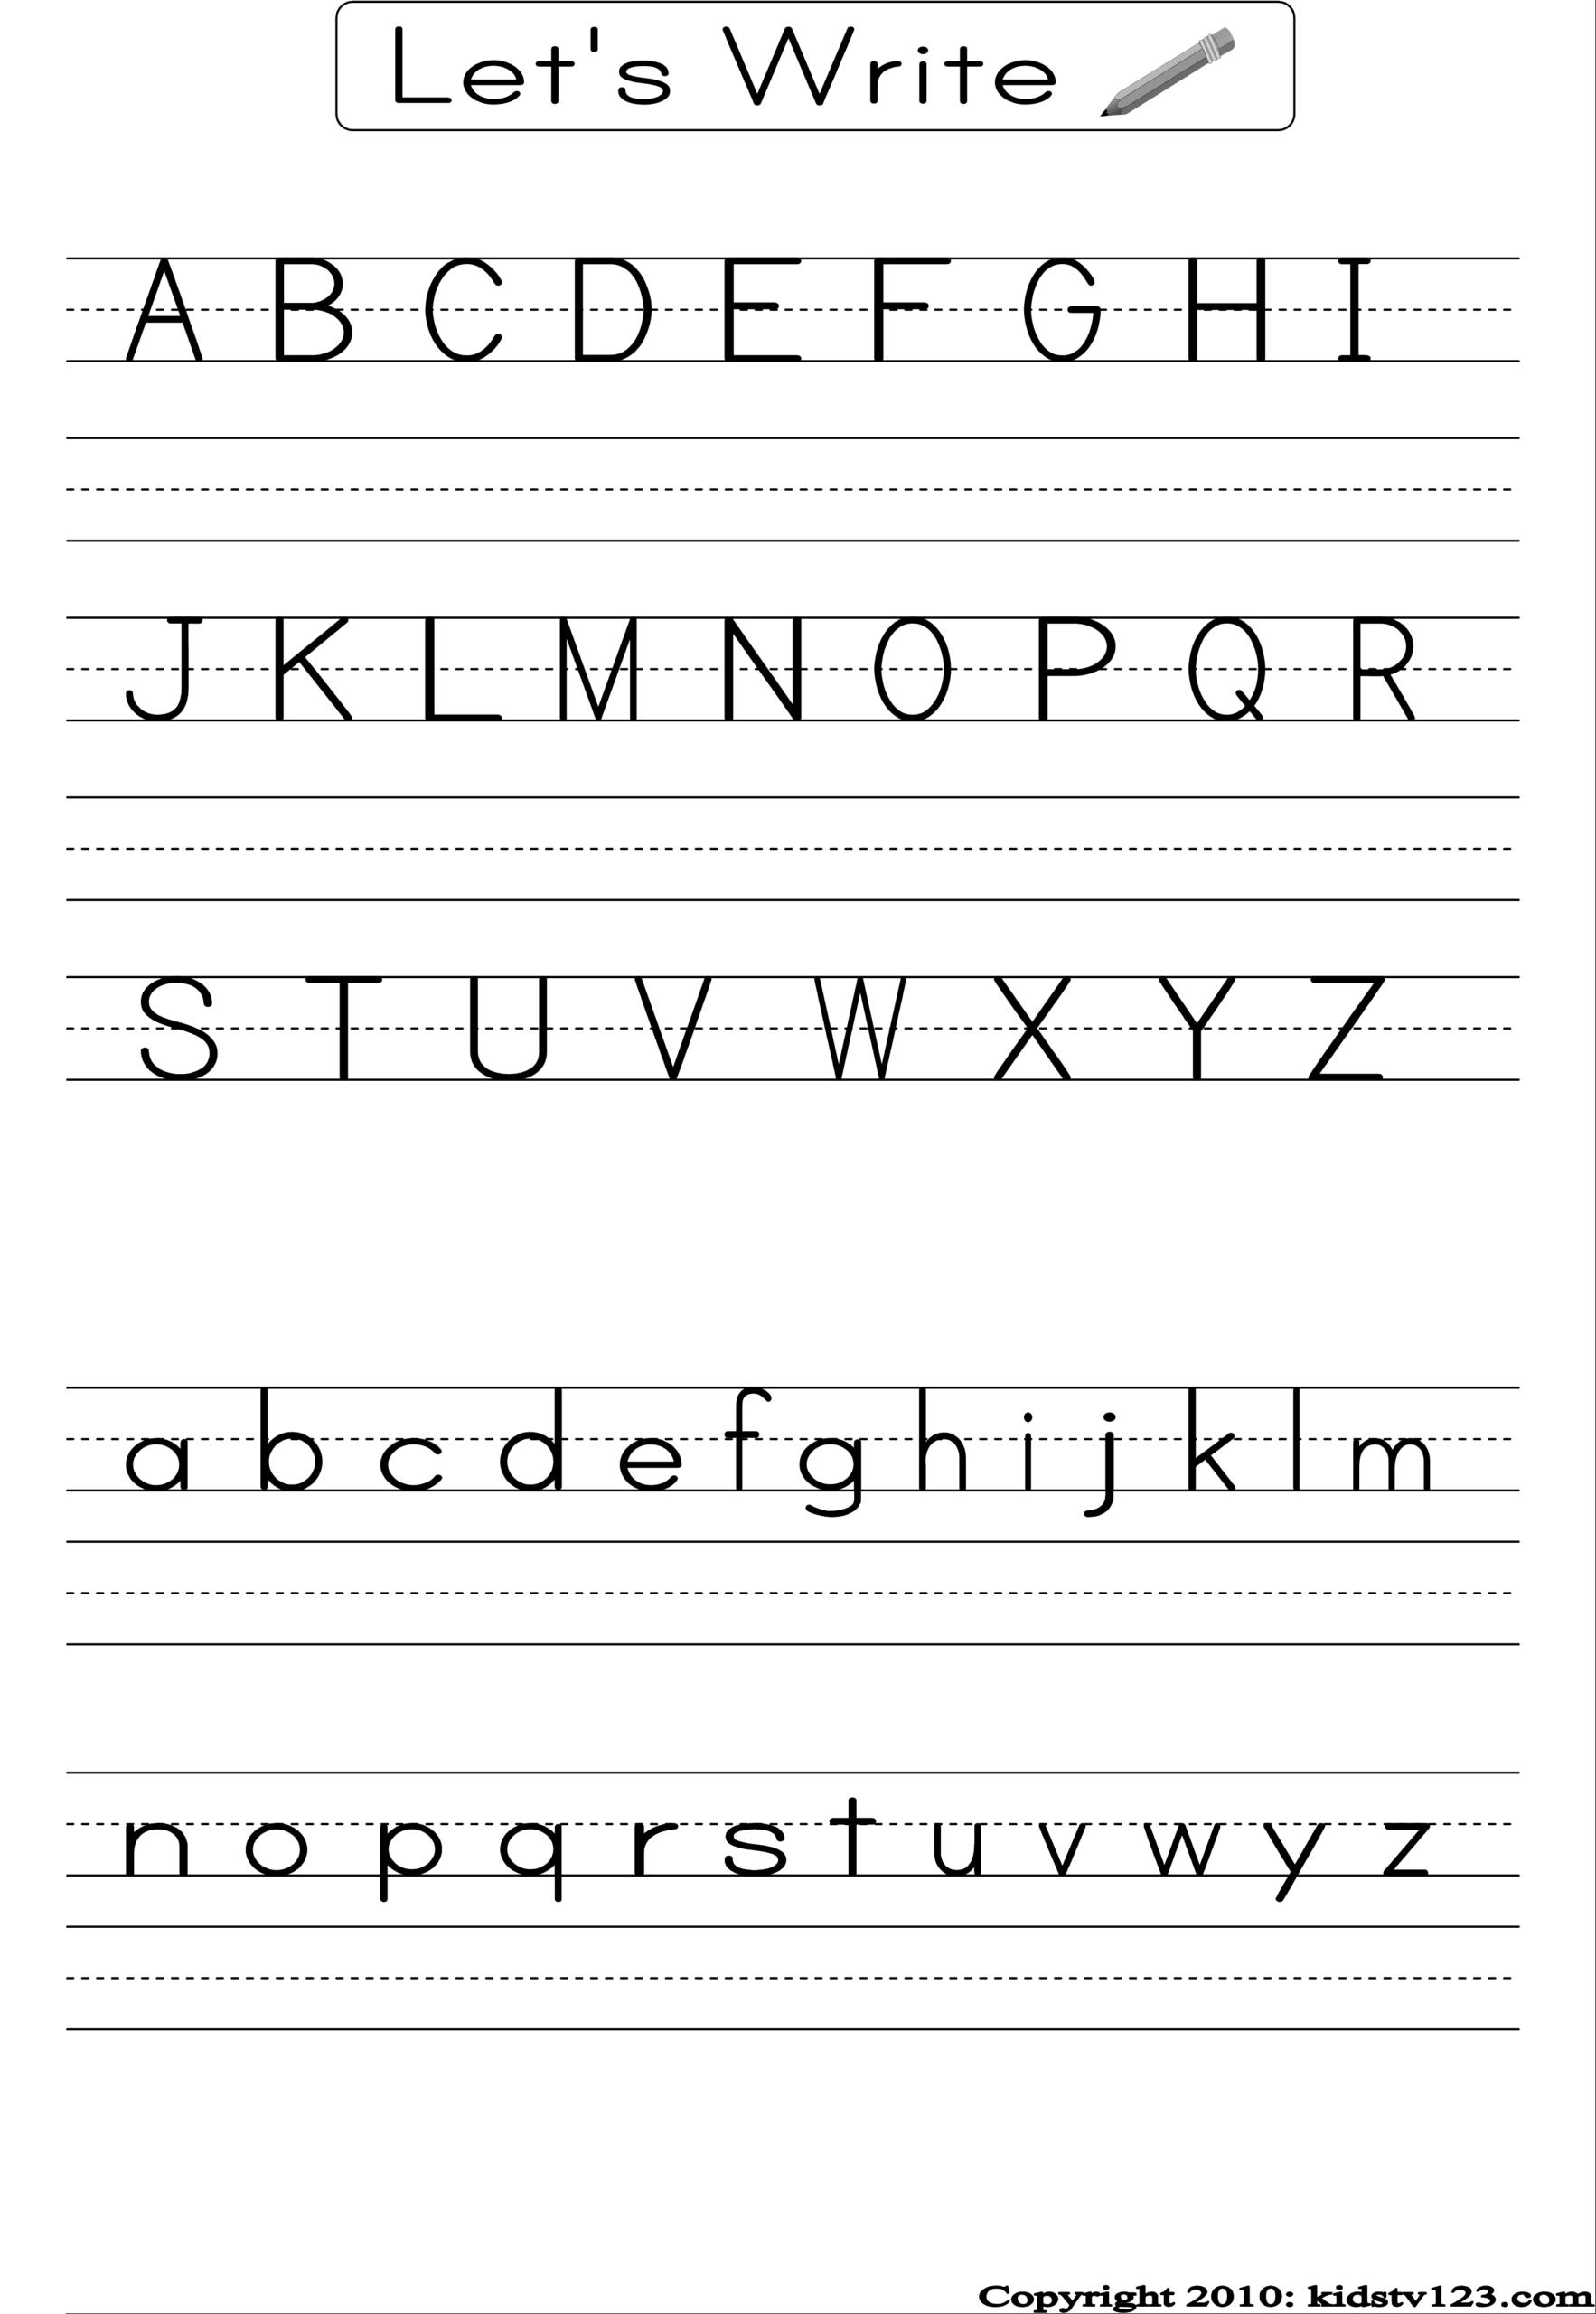 Alphabet Writing Practice Sheet | Alphabet Writing Practice throughout Alphabet Handwriting Worksheets A To Z For Preschool To First Grade